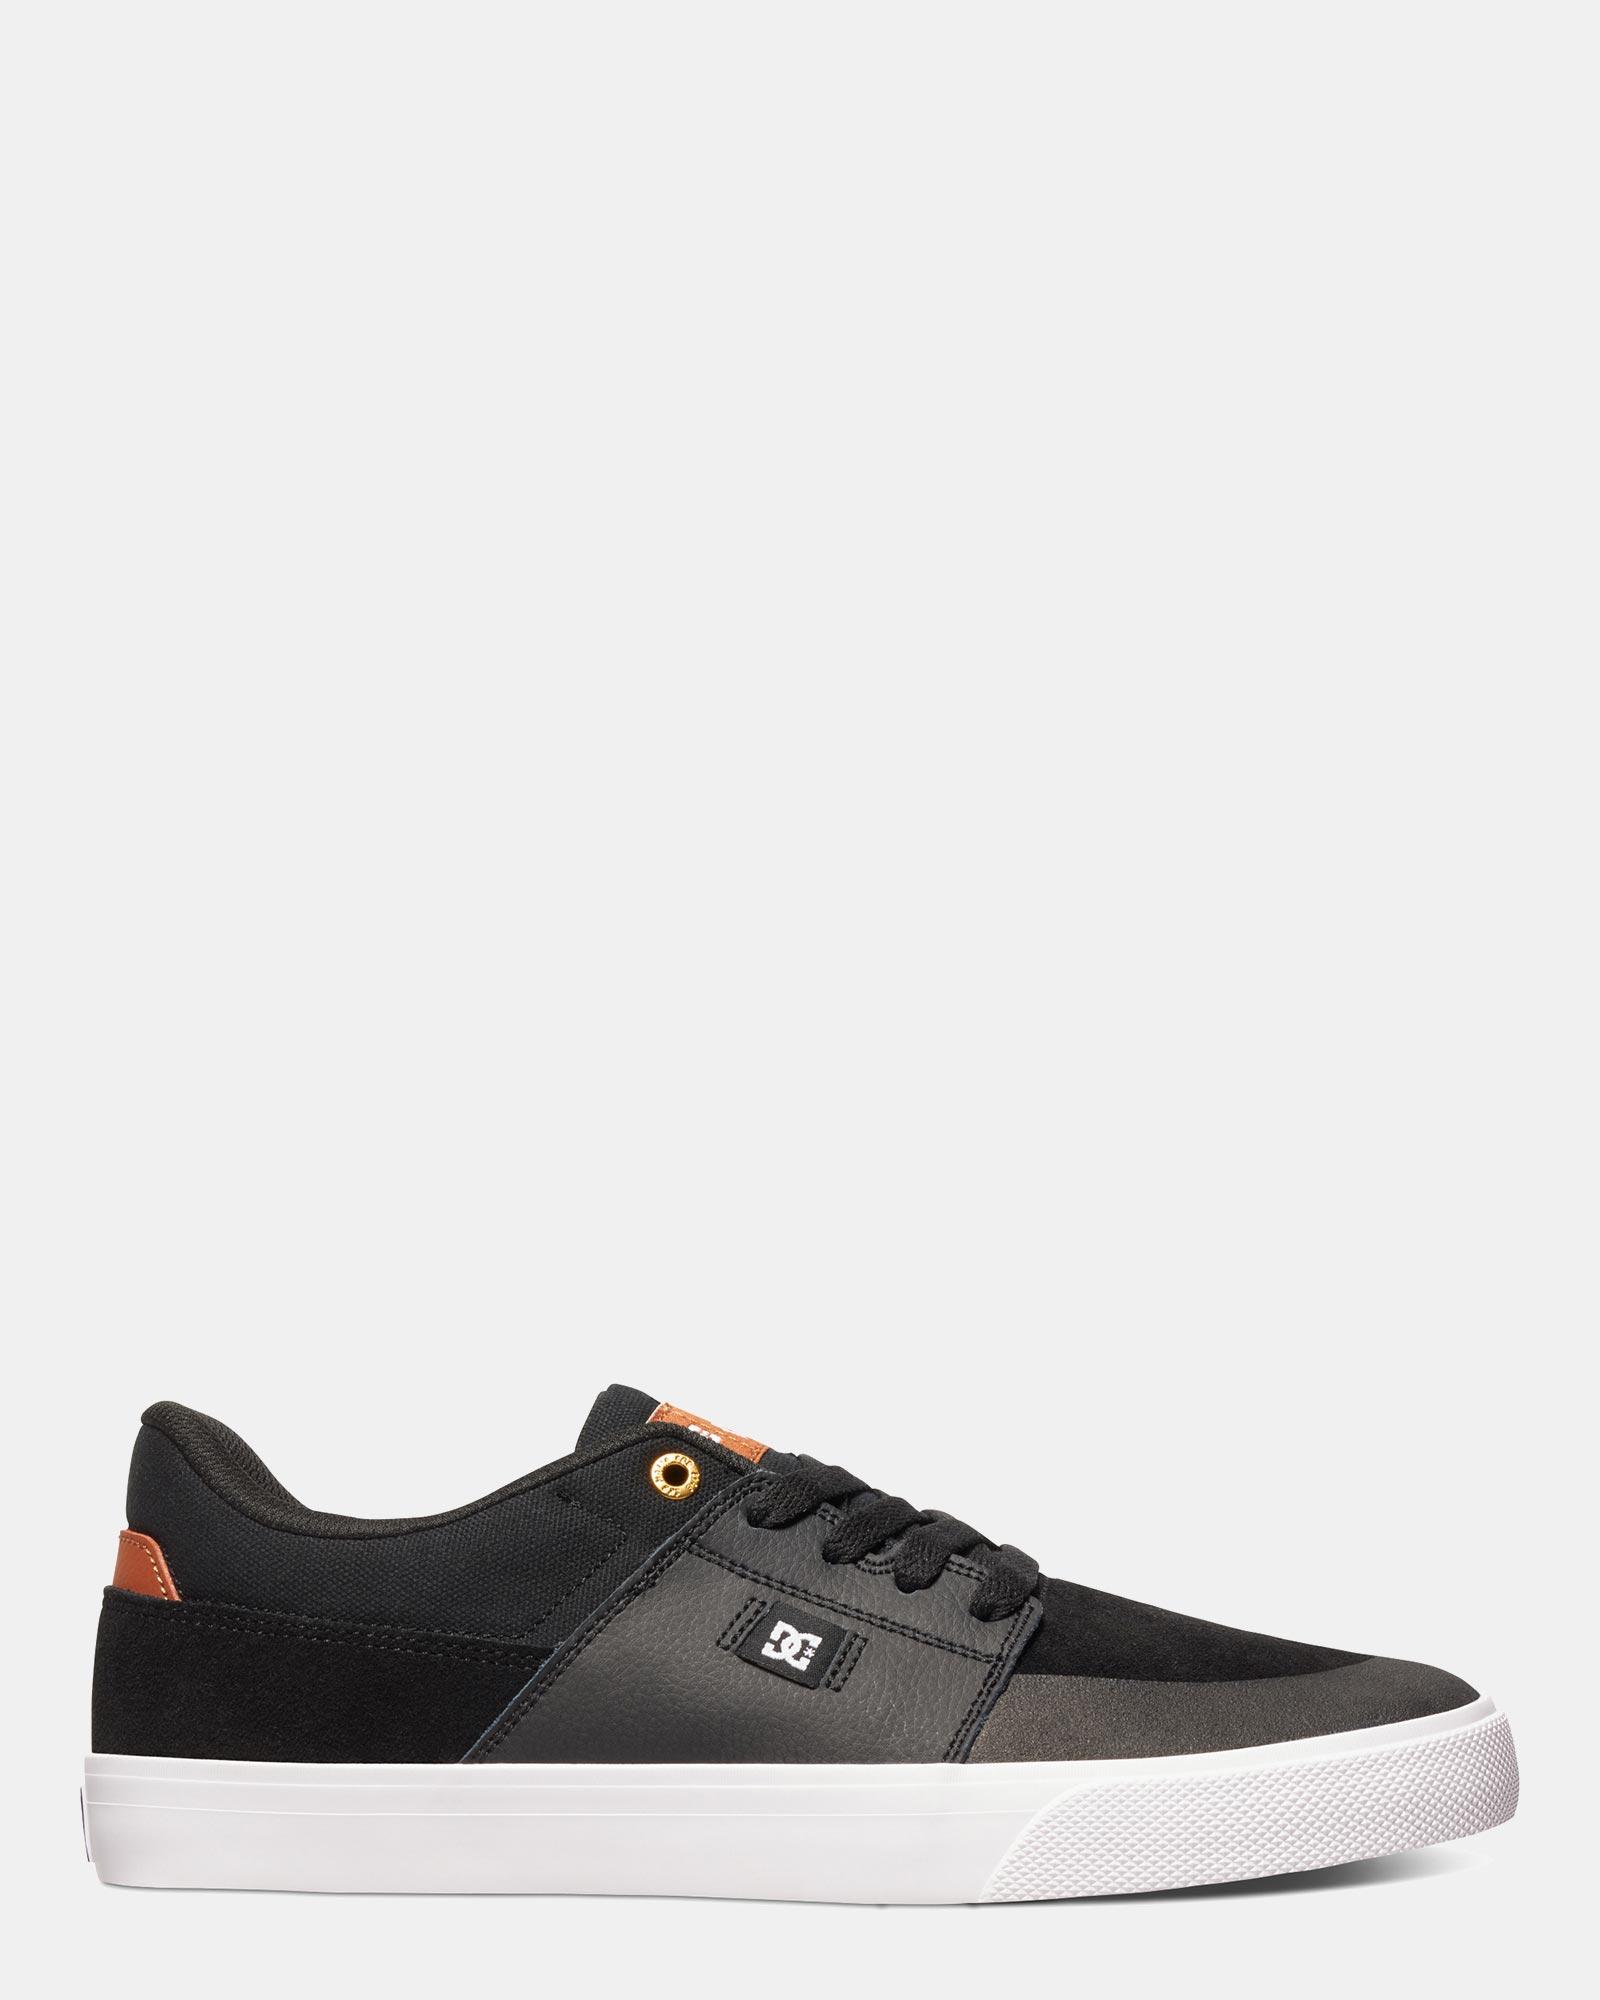 DC Mens Wes Kremer Shoe Black/Brown/White